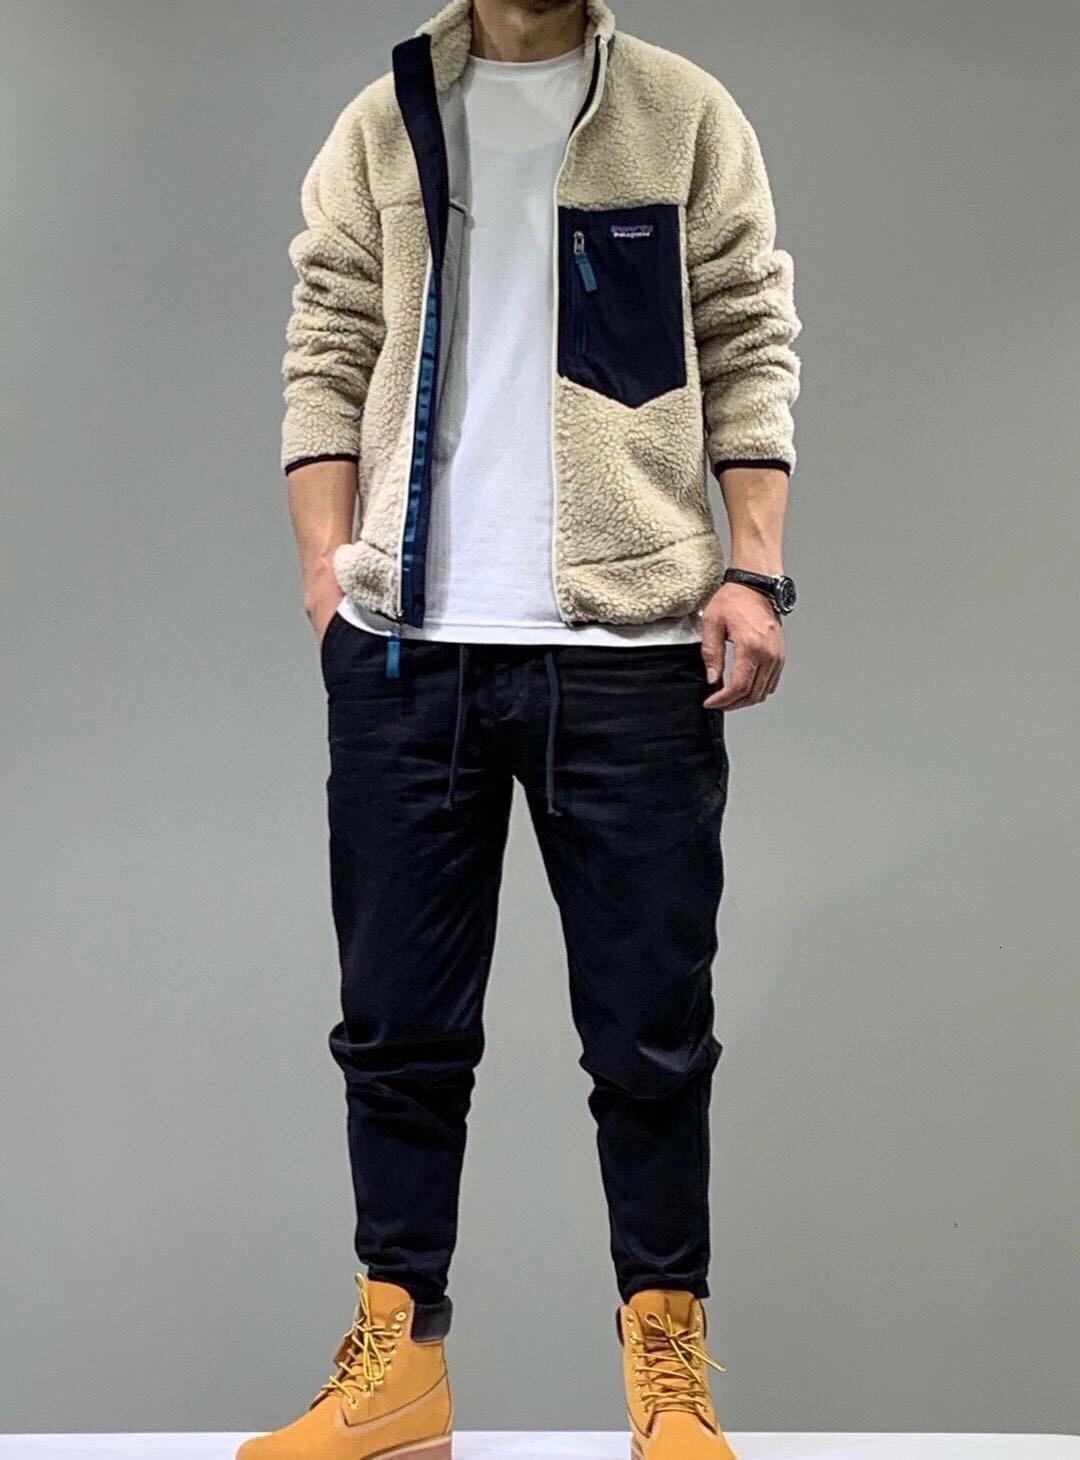 PATAGONIA Thick warm Classic Retro-X autumn winter couple models lamb cashmere fleece coat for men women 7448